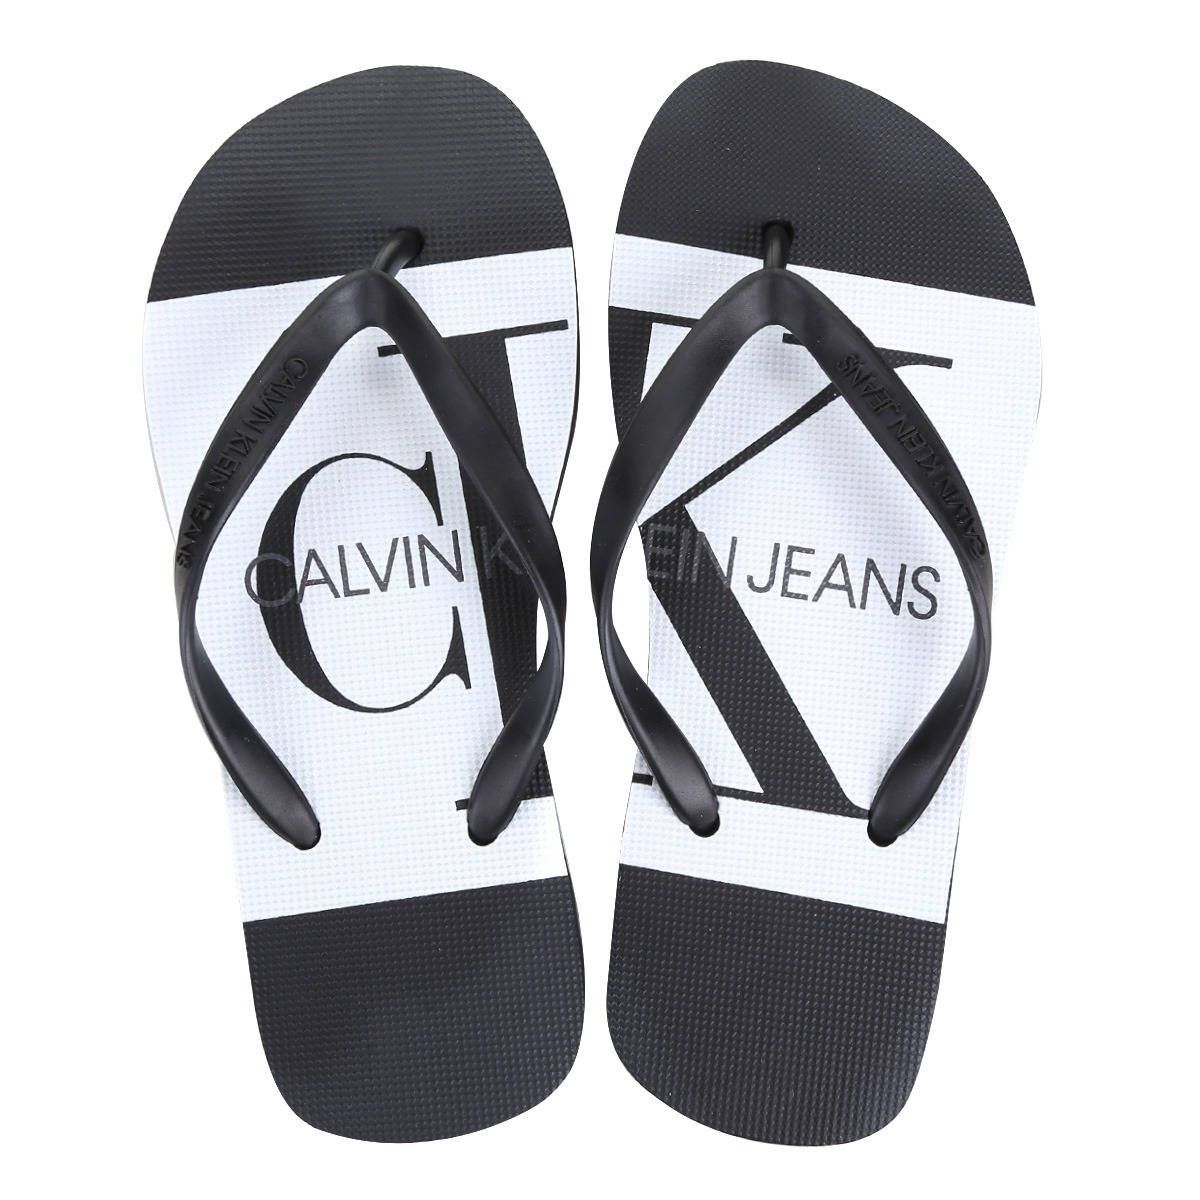 Chinelo Masculino Calvin Klein - R  79,00 em Mercado Livre 895405dcc3